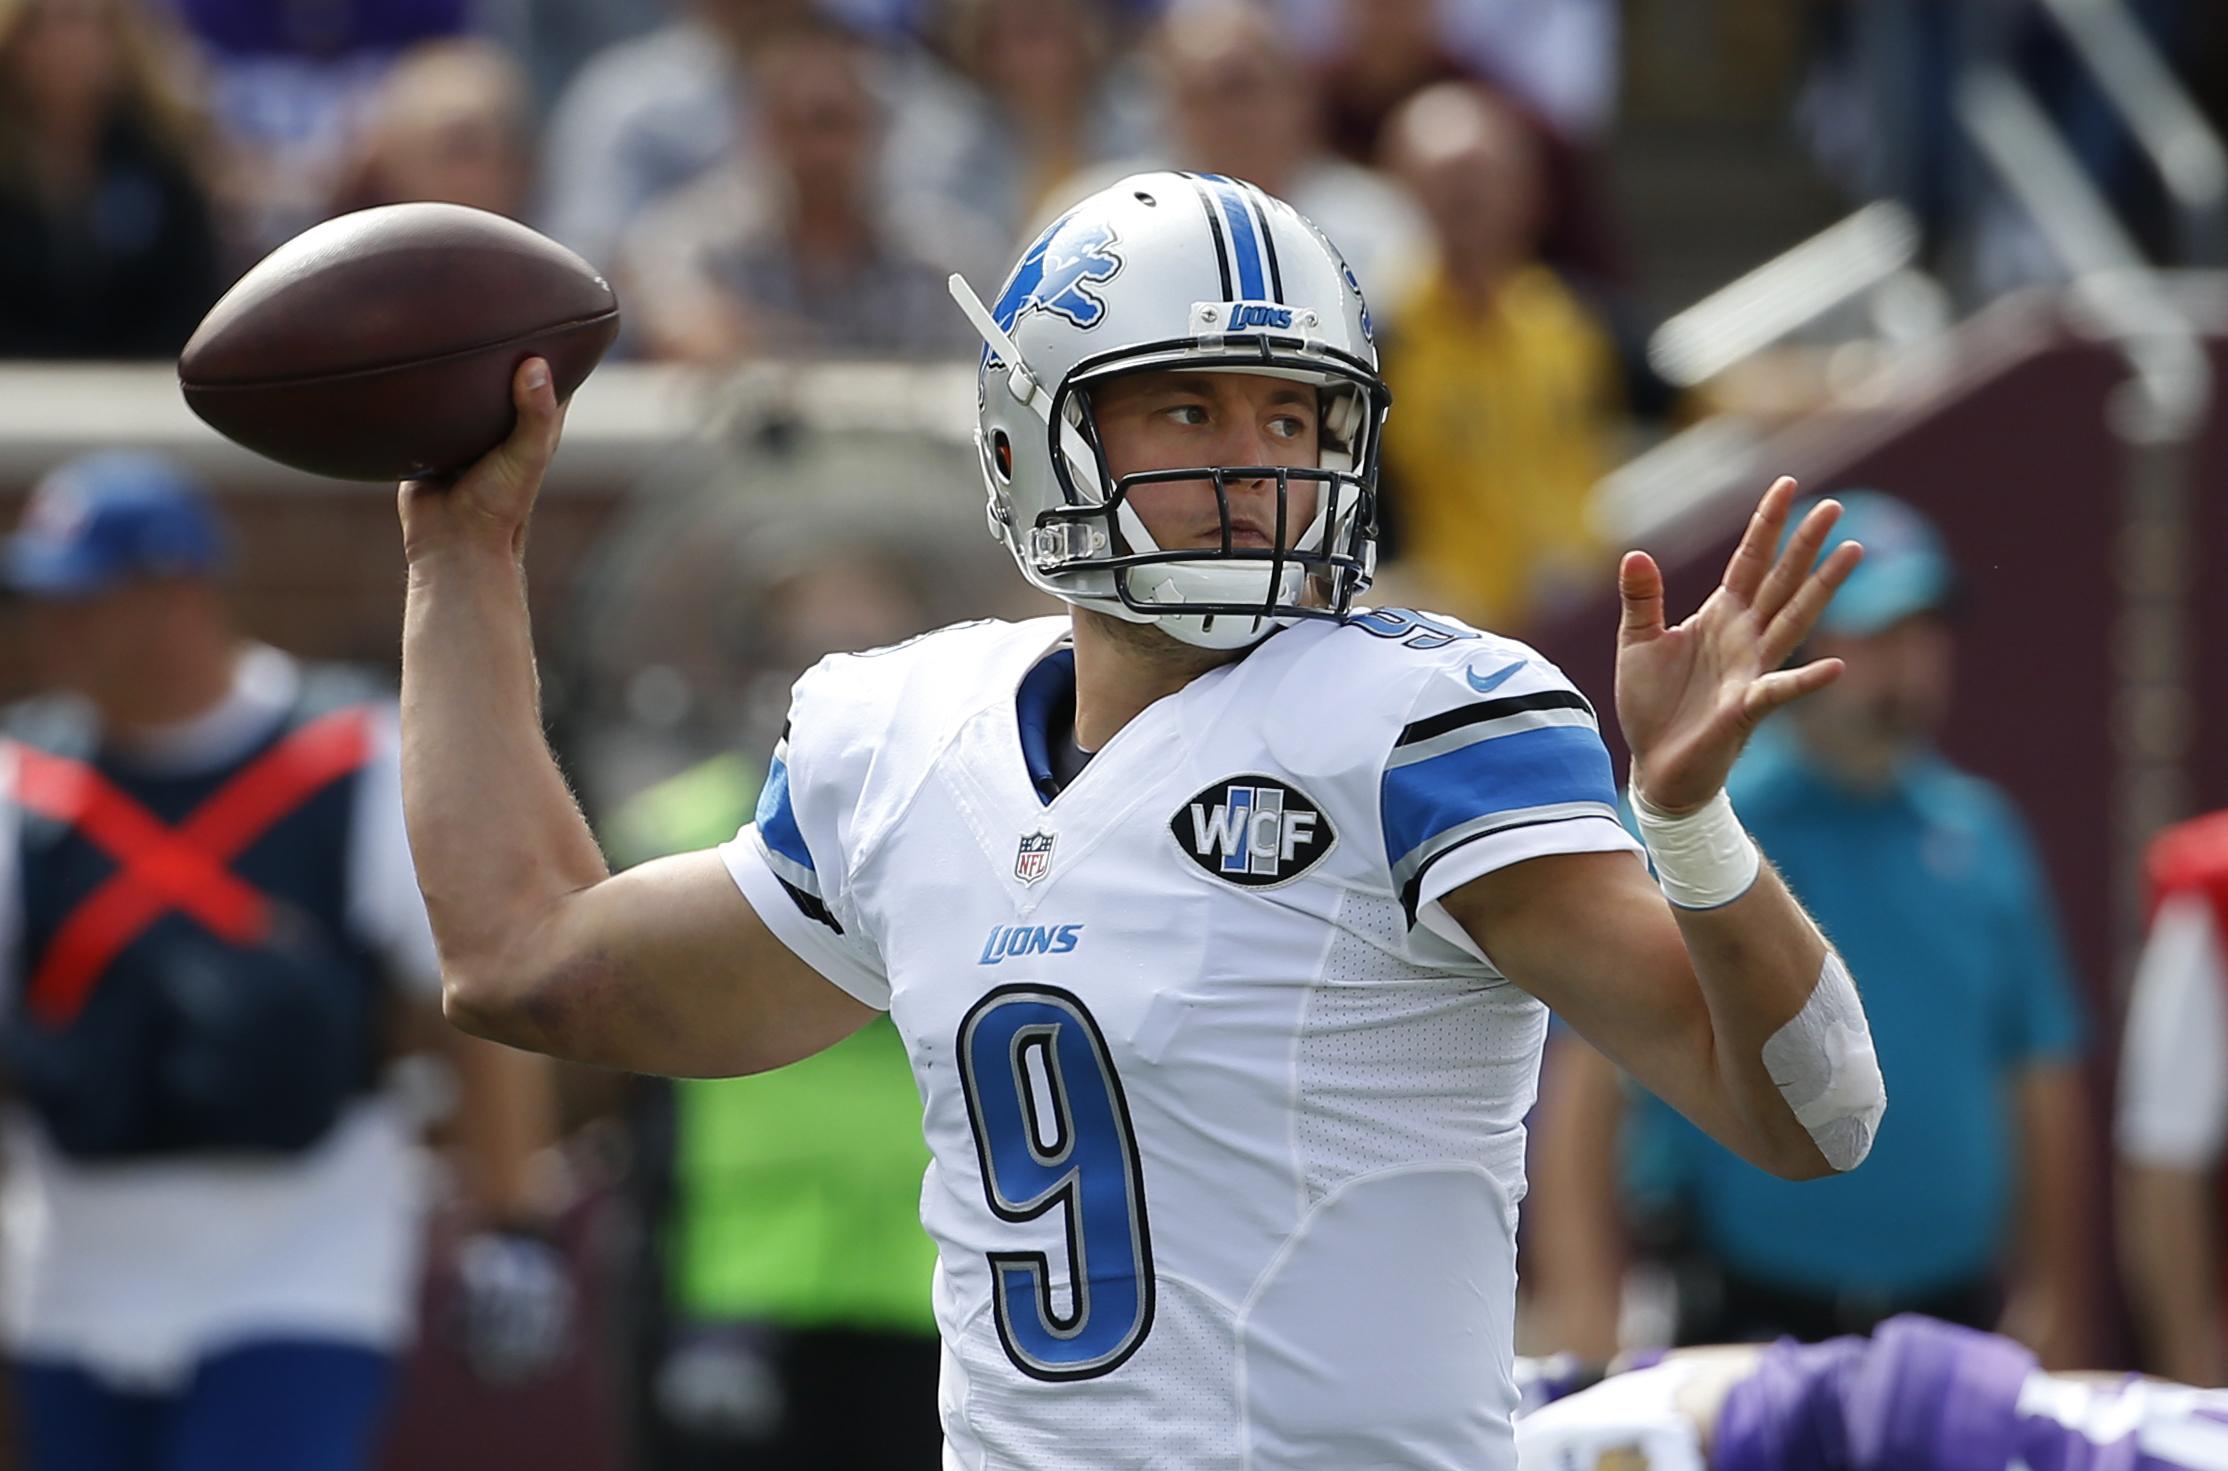 Detroit Lions quarterback Matthew Stafford (9) throws against the Minnesota Vikings in the first half of an NFL football game in Minneapolis, Sunday, Sept. 20, 2015. (AP Photo/Ann Heisenfelt)